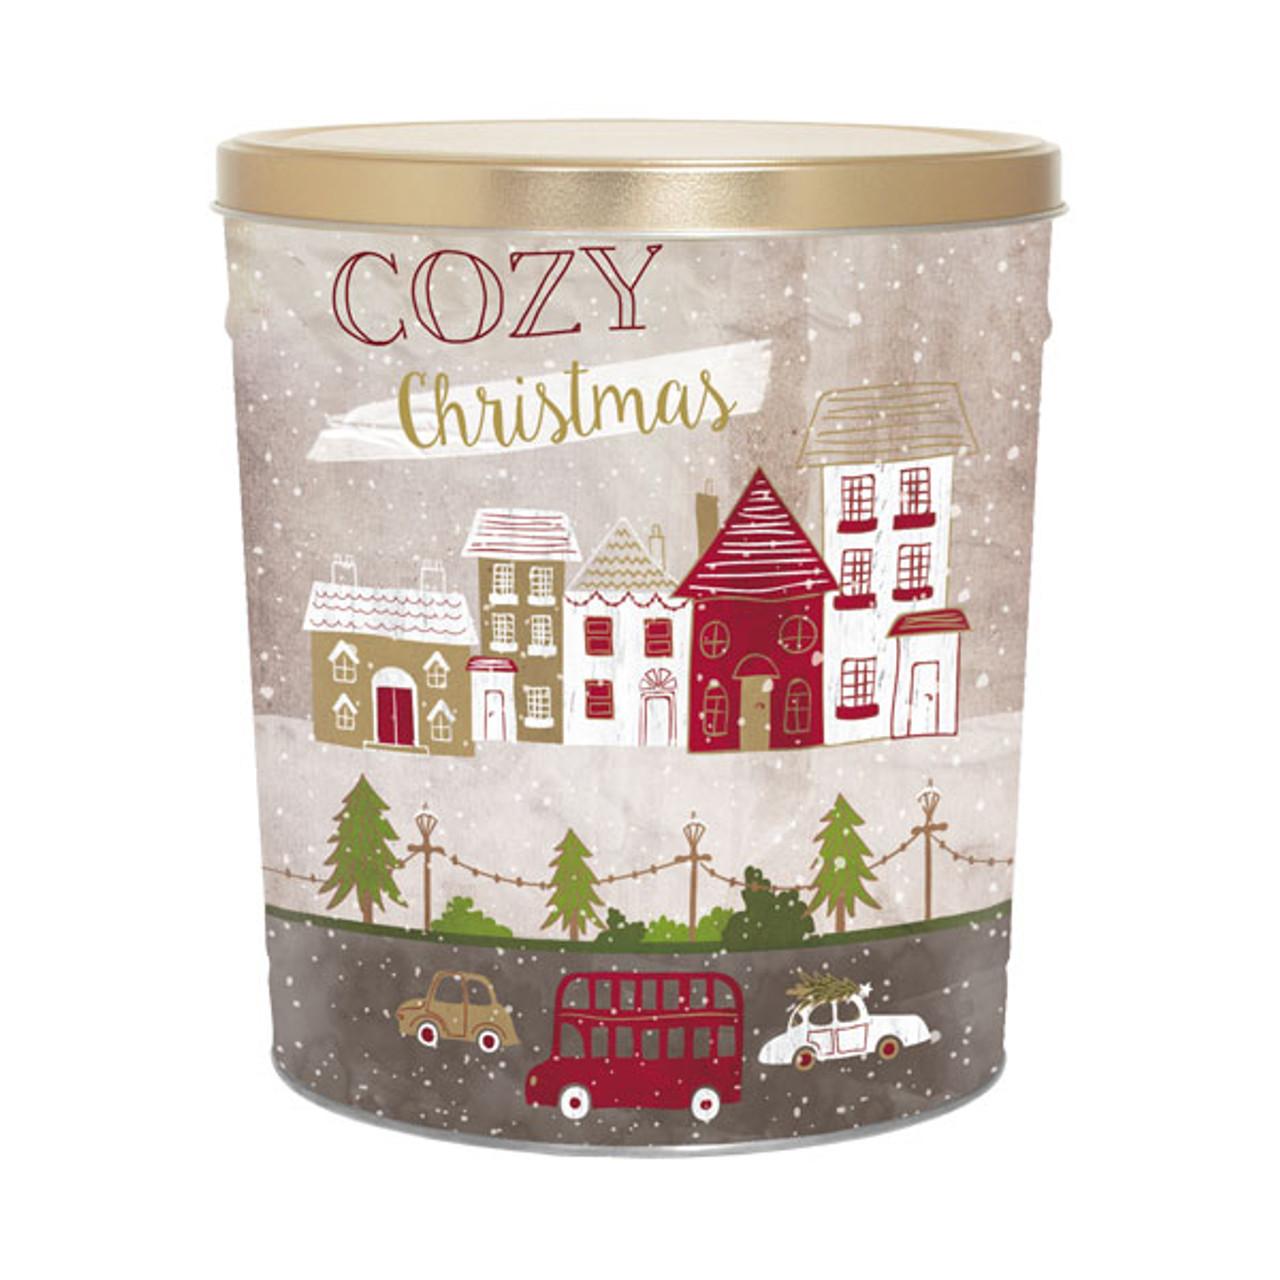 Christmas Tins.3 5 Gal Decorative Holiday Tins Cozy Christmas 9111t23cozy